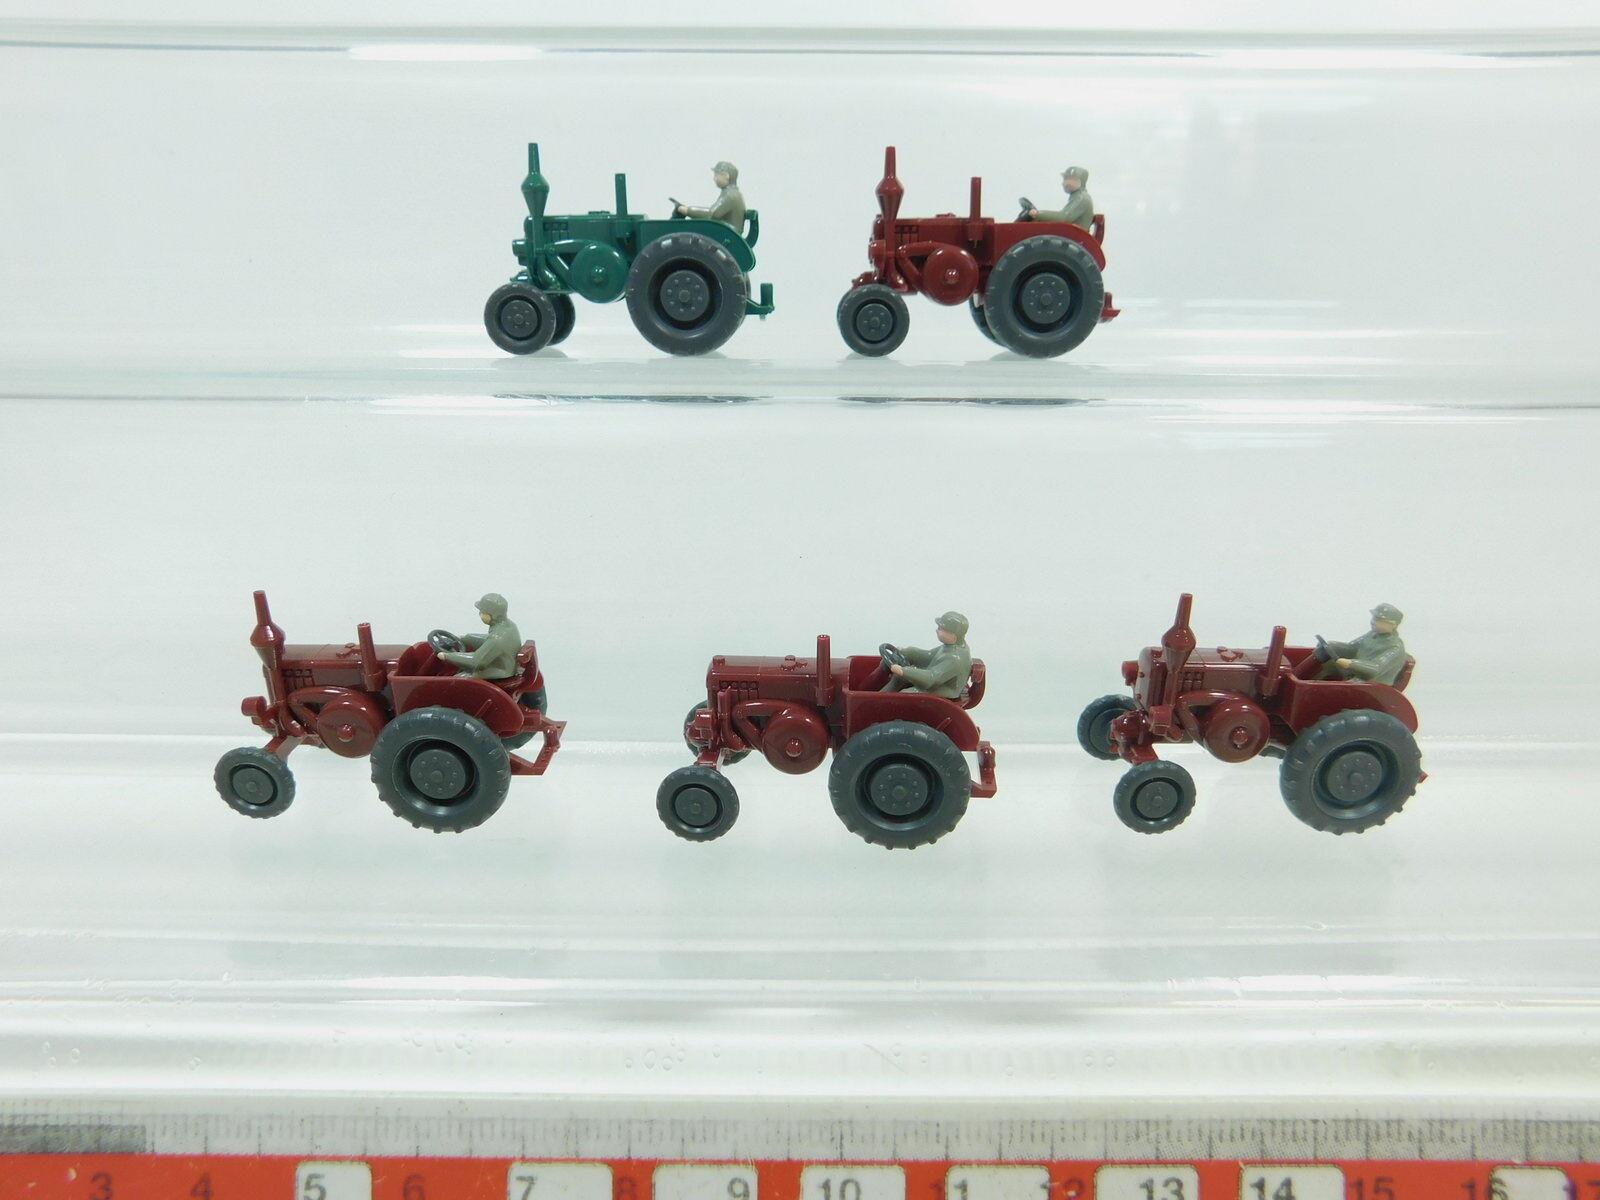 Bk29-0, 5 x Wiking H0   1 87 3080 Bulldog tractor lanz , MINT